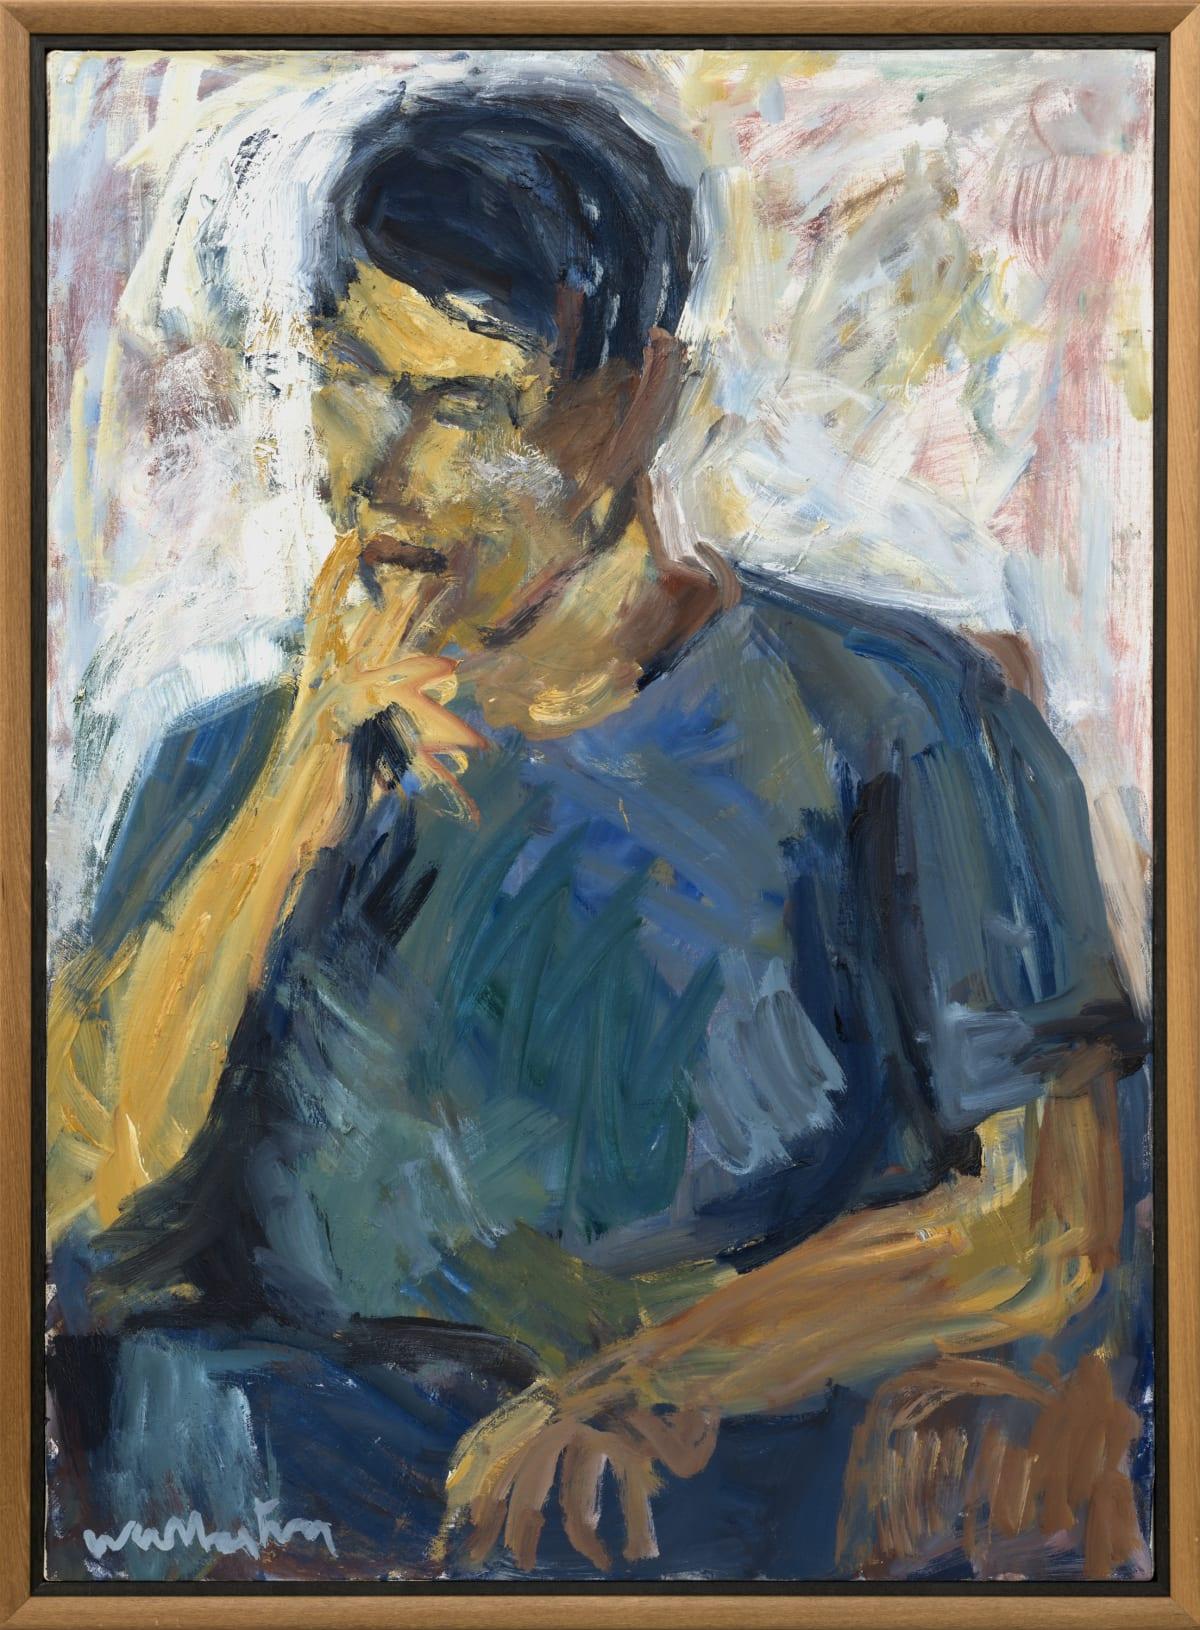 Mountford Tosswill Woollaston, Untitled [Portrait of a Man], n.d.